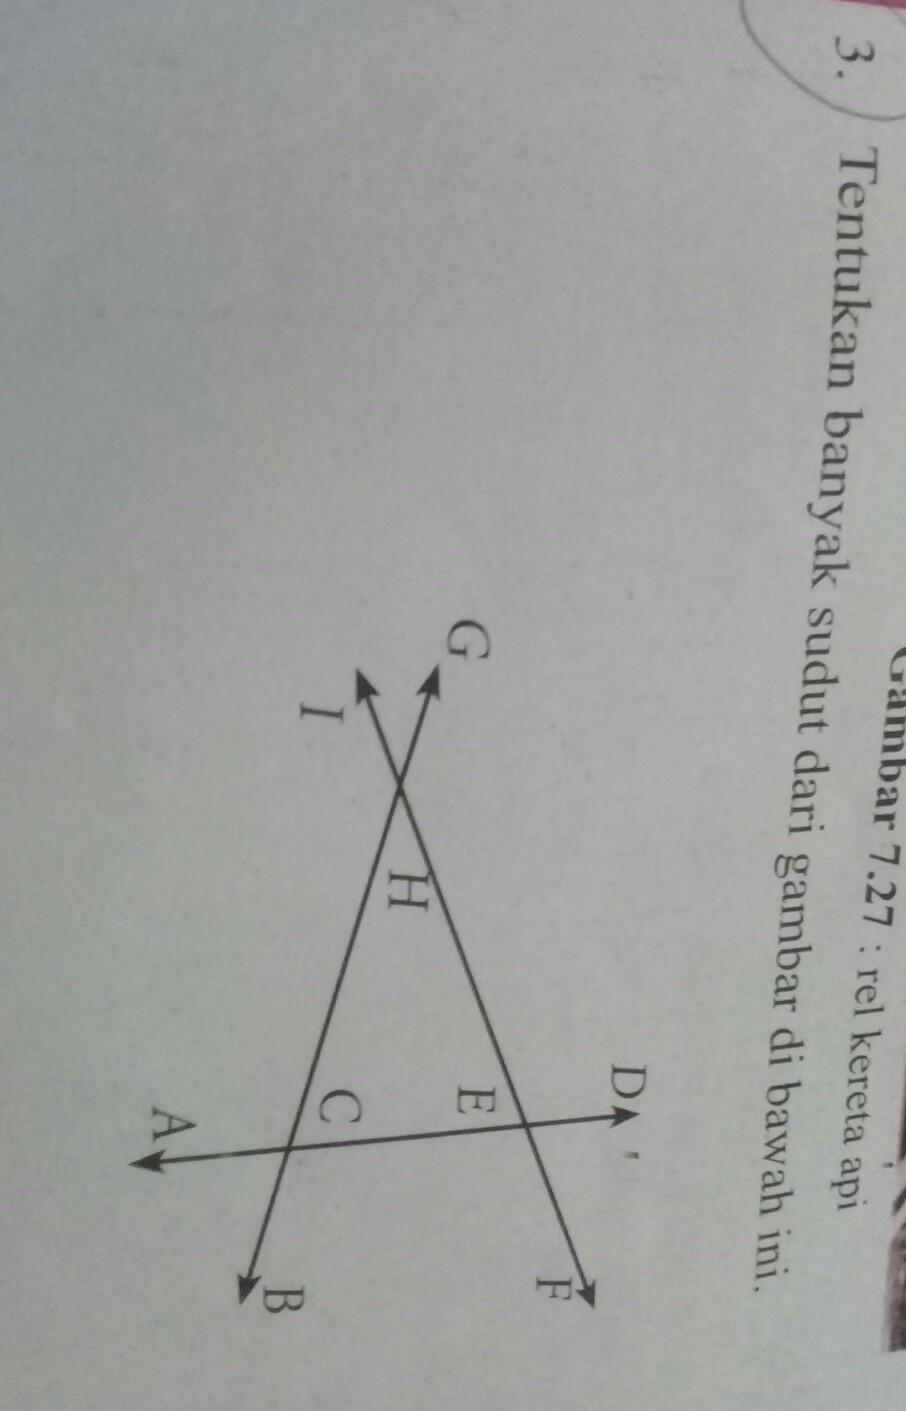 Ayo Kita Berlatih 7 3 Hal 139 Kelas 7 Semester 2 No 3 Jawabannya Apa Brainly Co Id